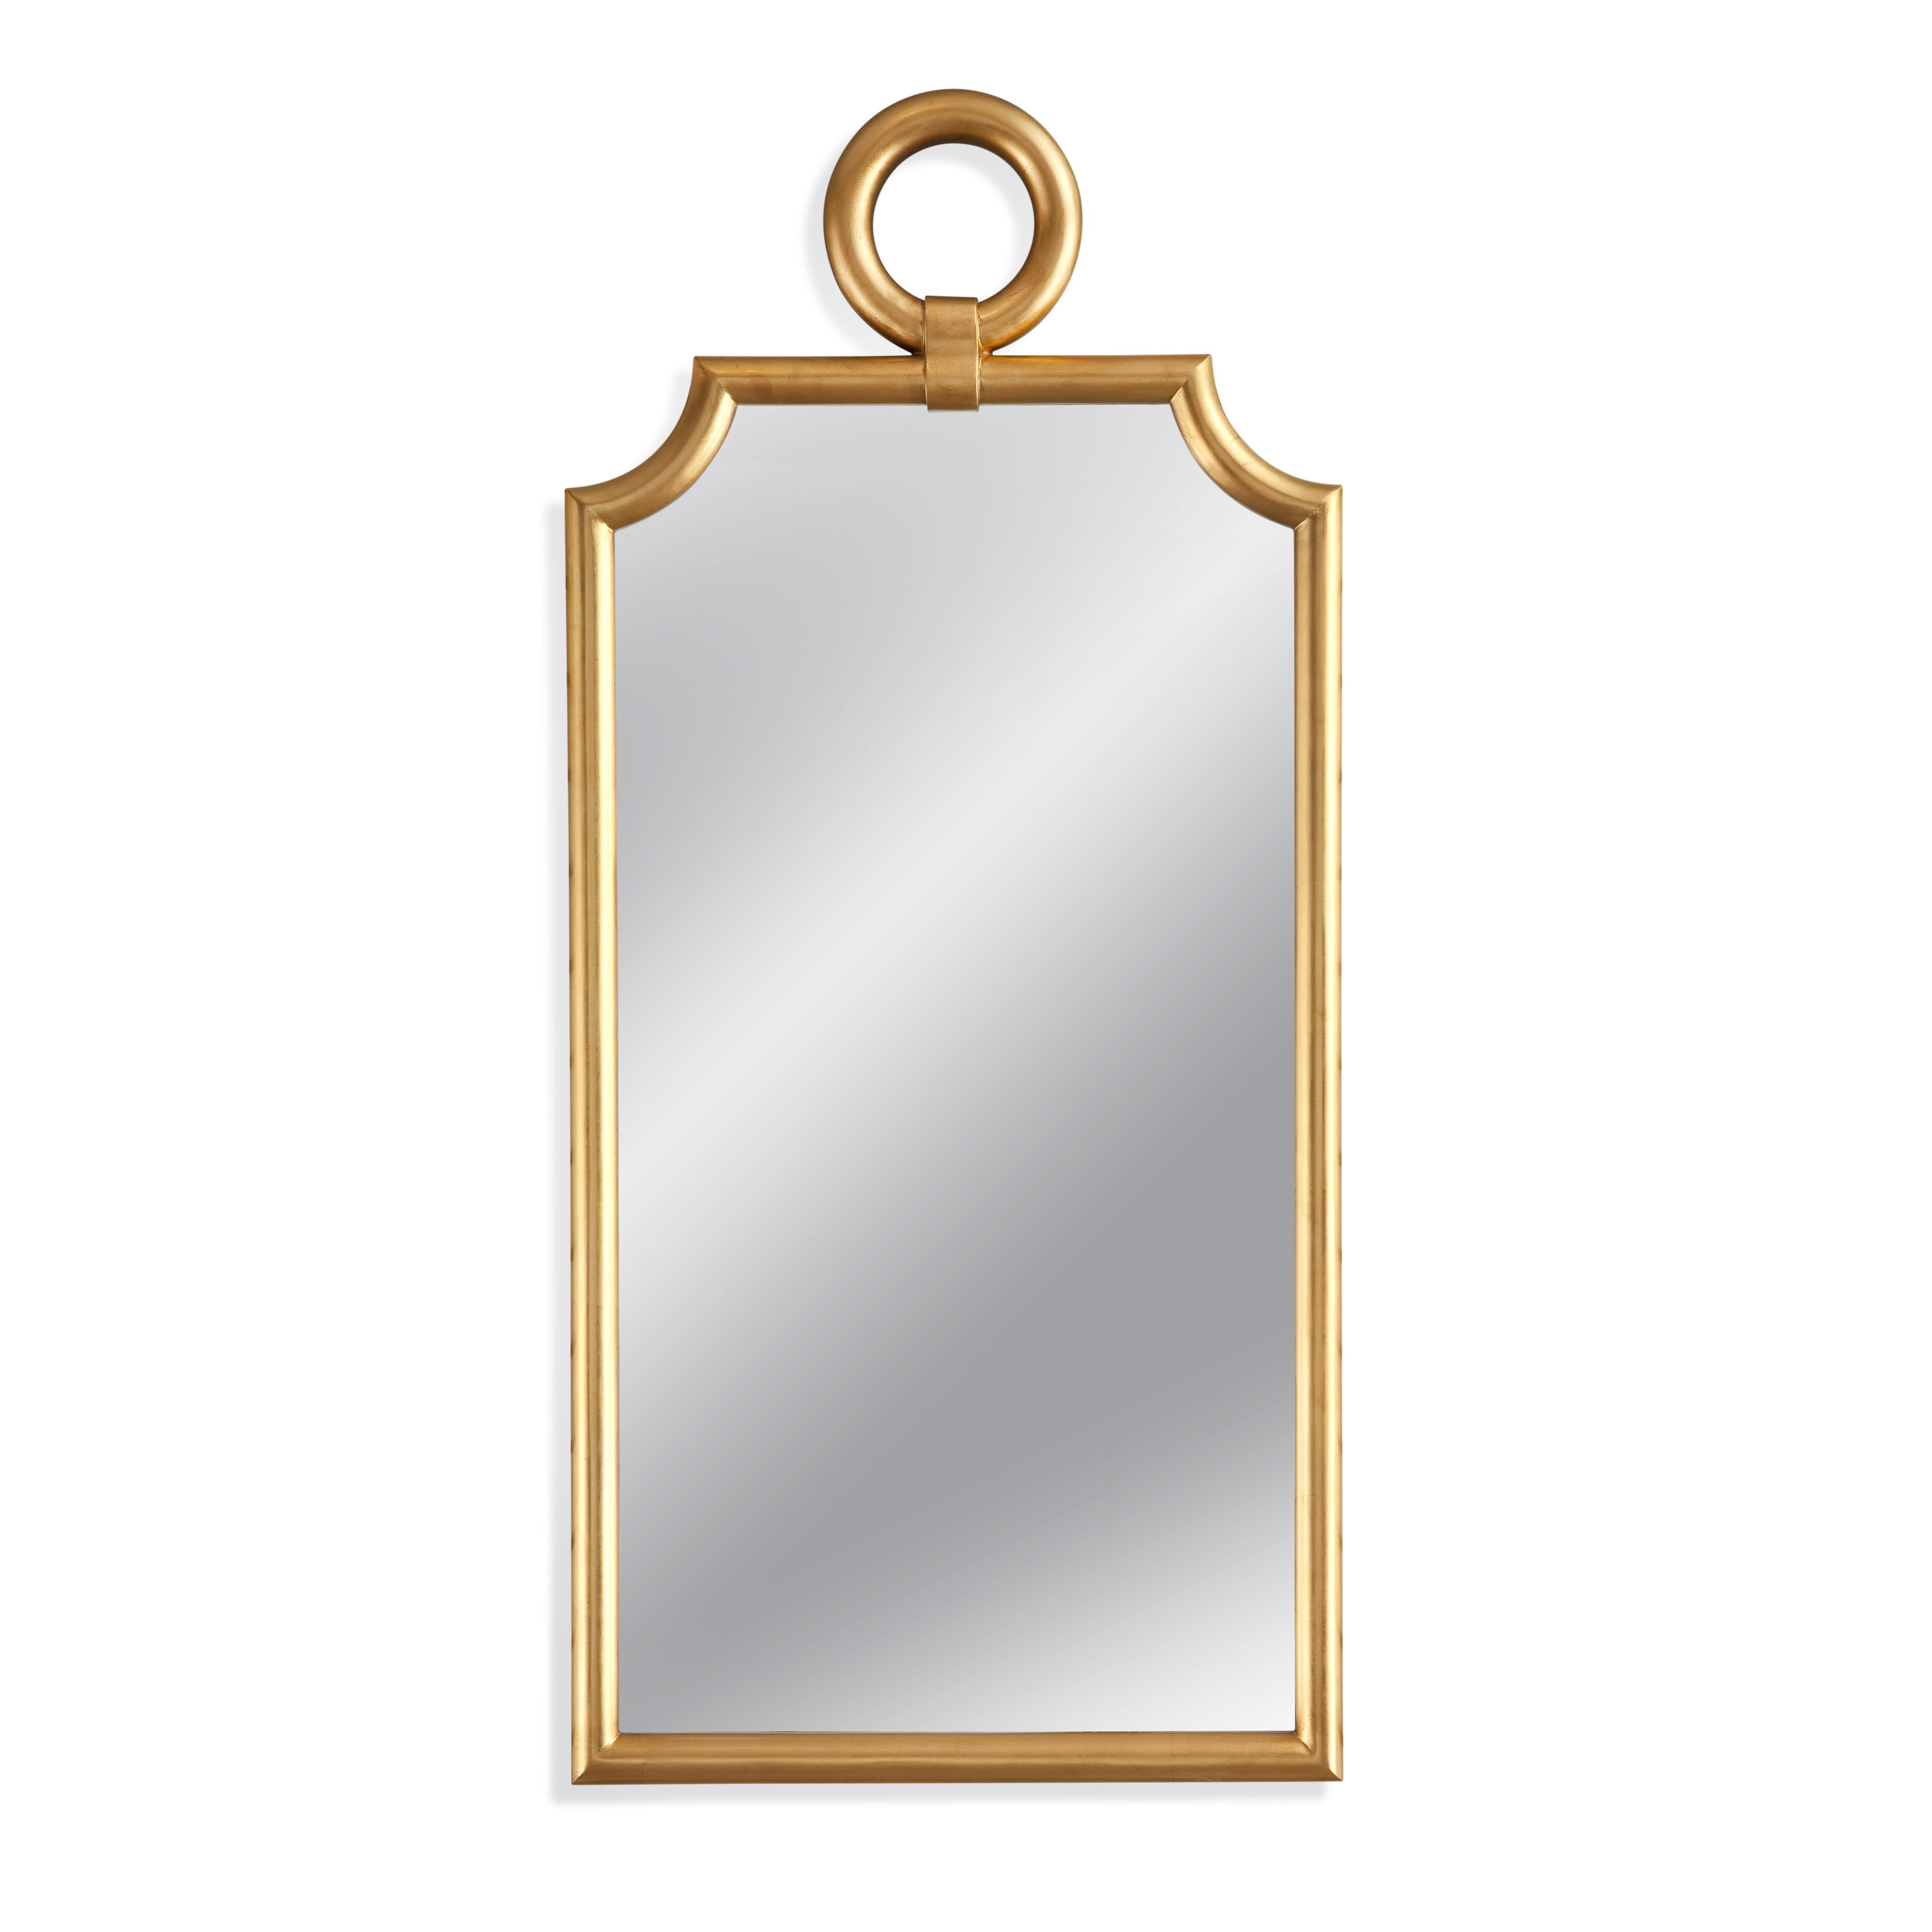 Old World Nahla Wall Mirror by Bassett Mirror at Alison Craig Home Furnishings